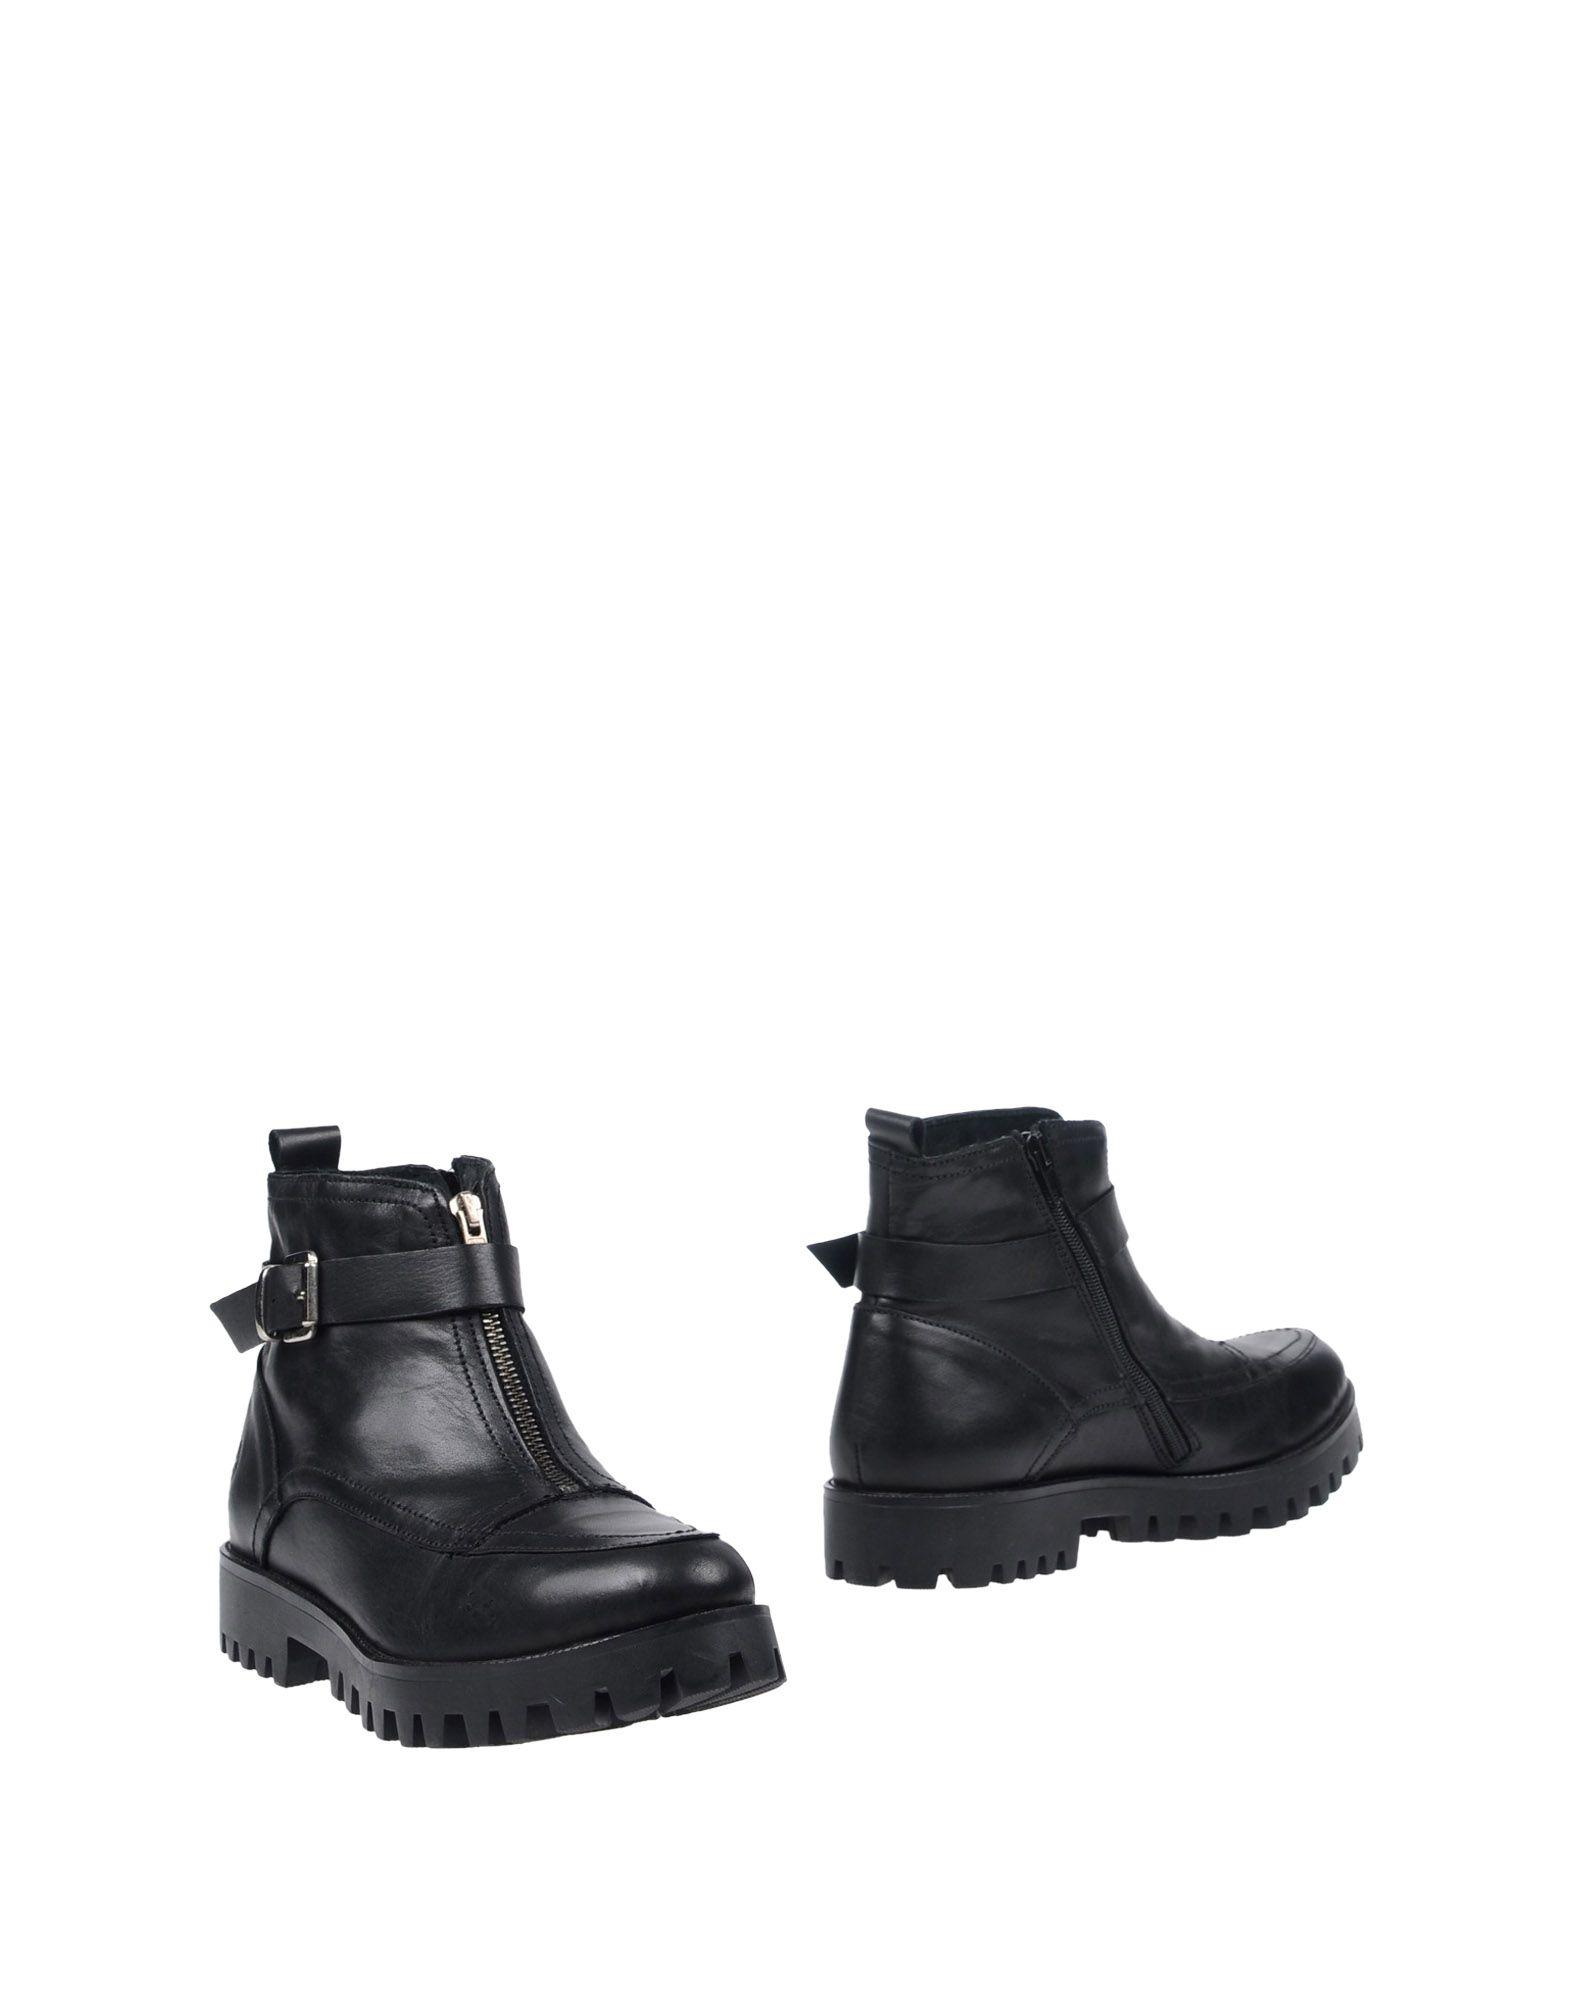 BRONX Полусапоги и высокие ботинки magazzini del sale полусапоги и высокие ботинки